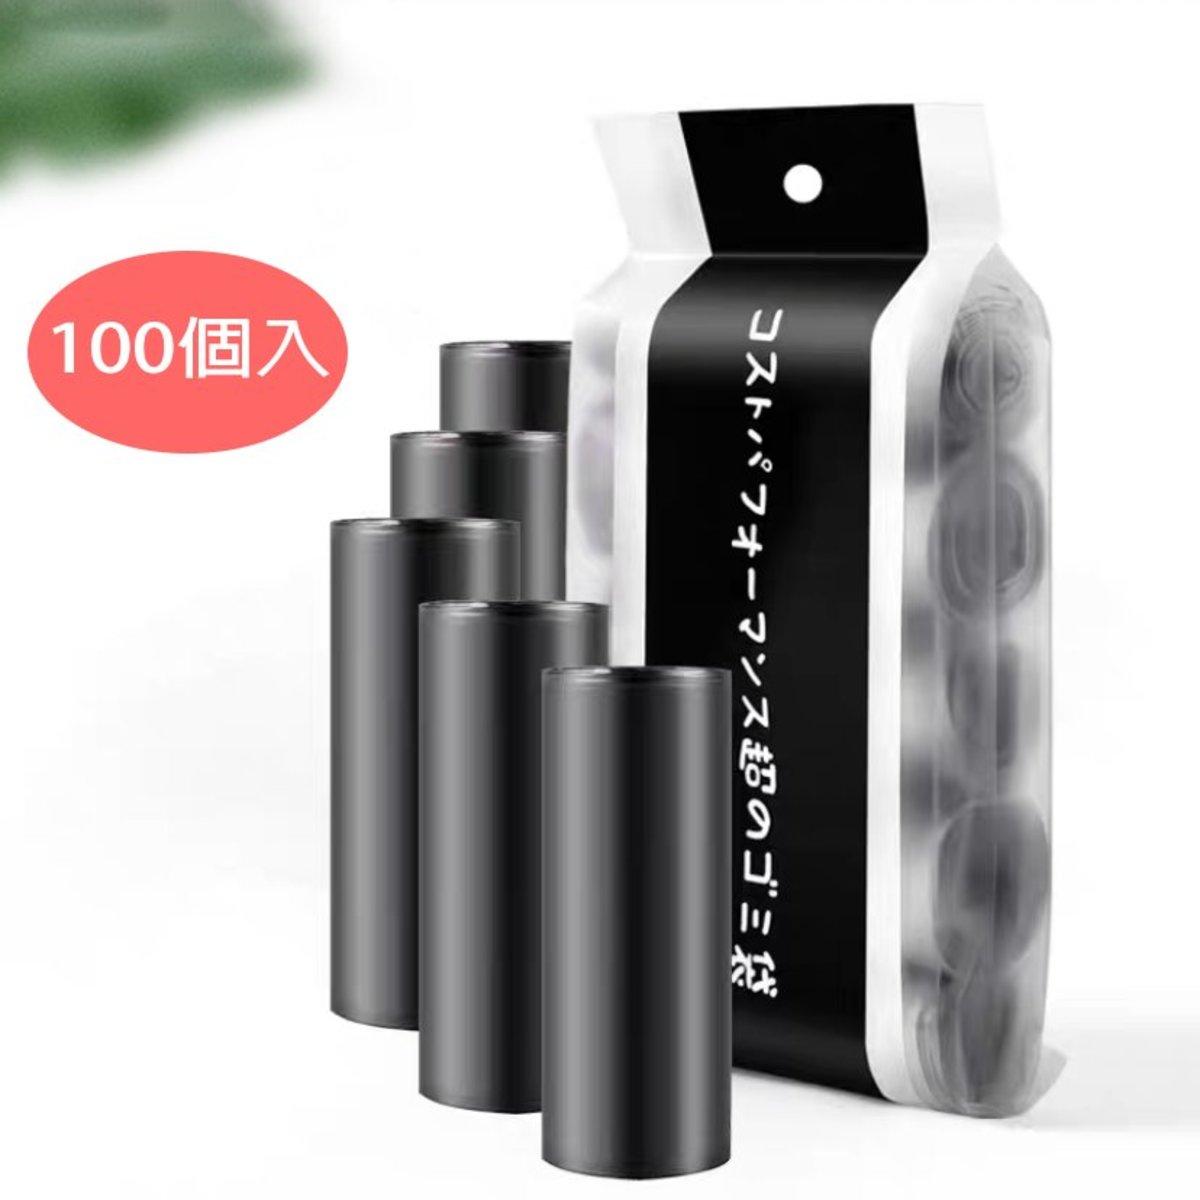 Simplicity Weight Endurace Garbage Bags 45x50cm (20 pcs/roll, 5 rolls/bag) x 1 Bag - black